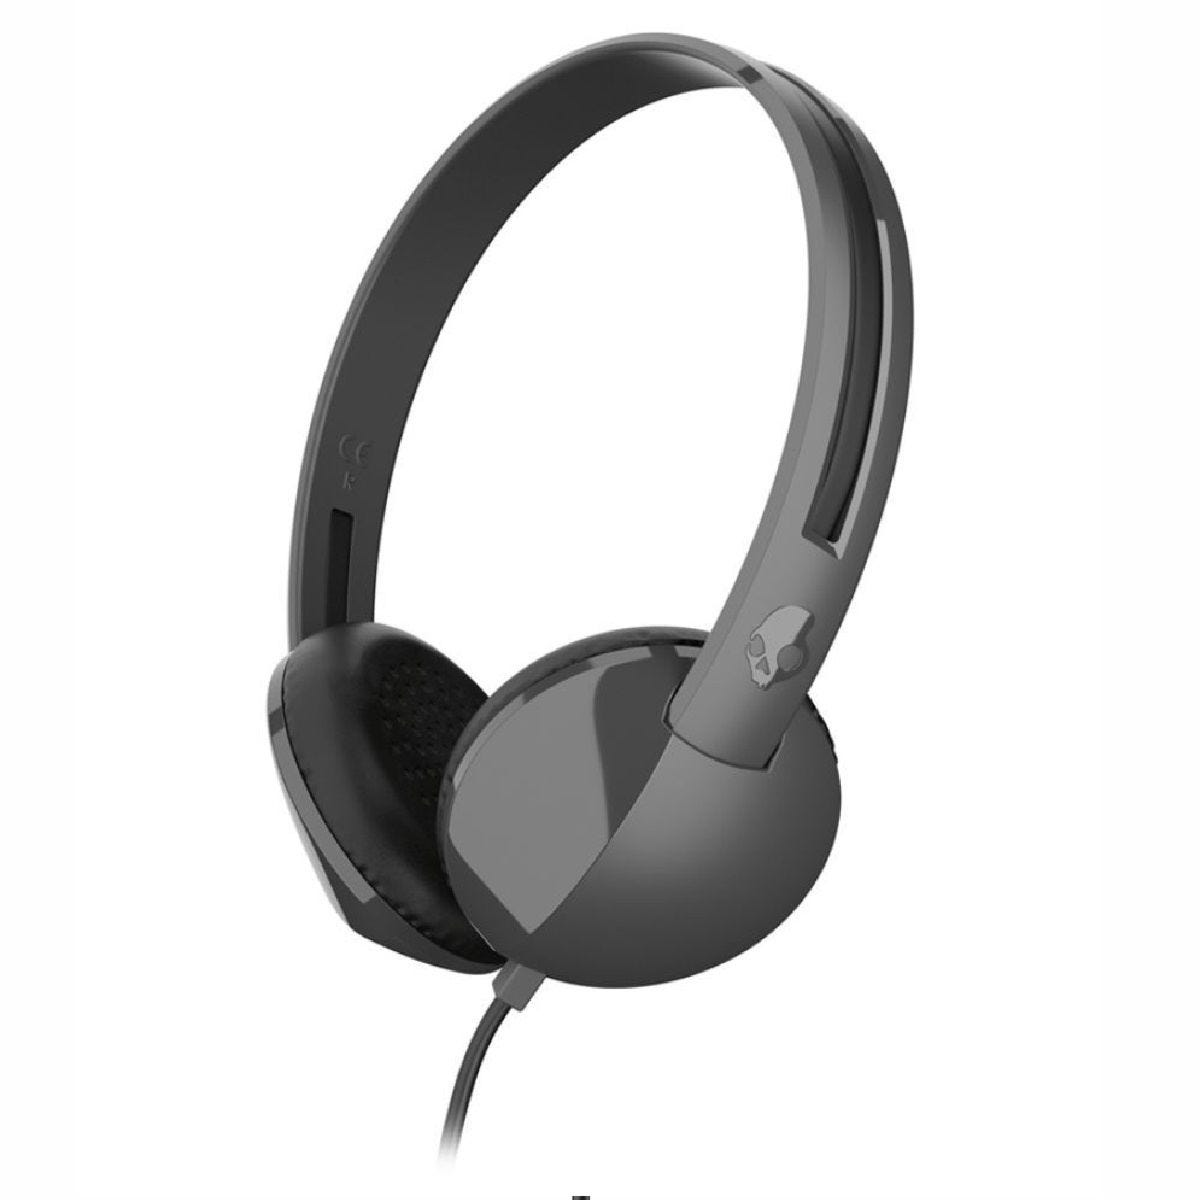 Skullcandy Anti Headphones - Charcoal/Black